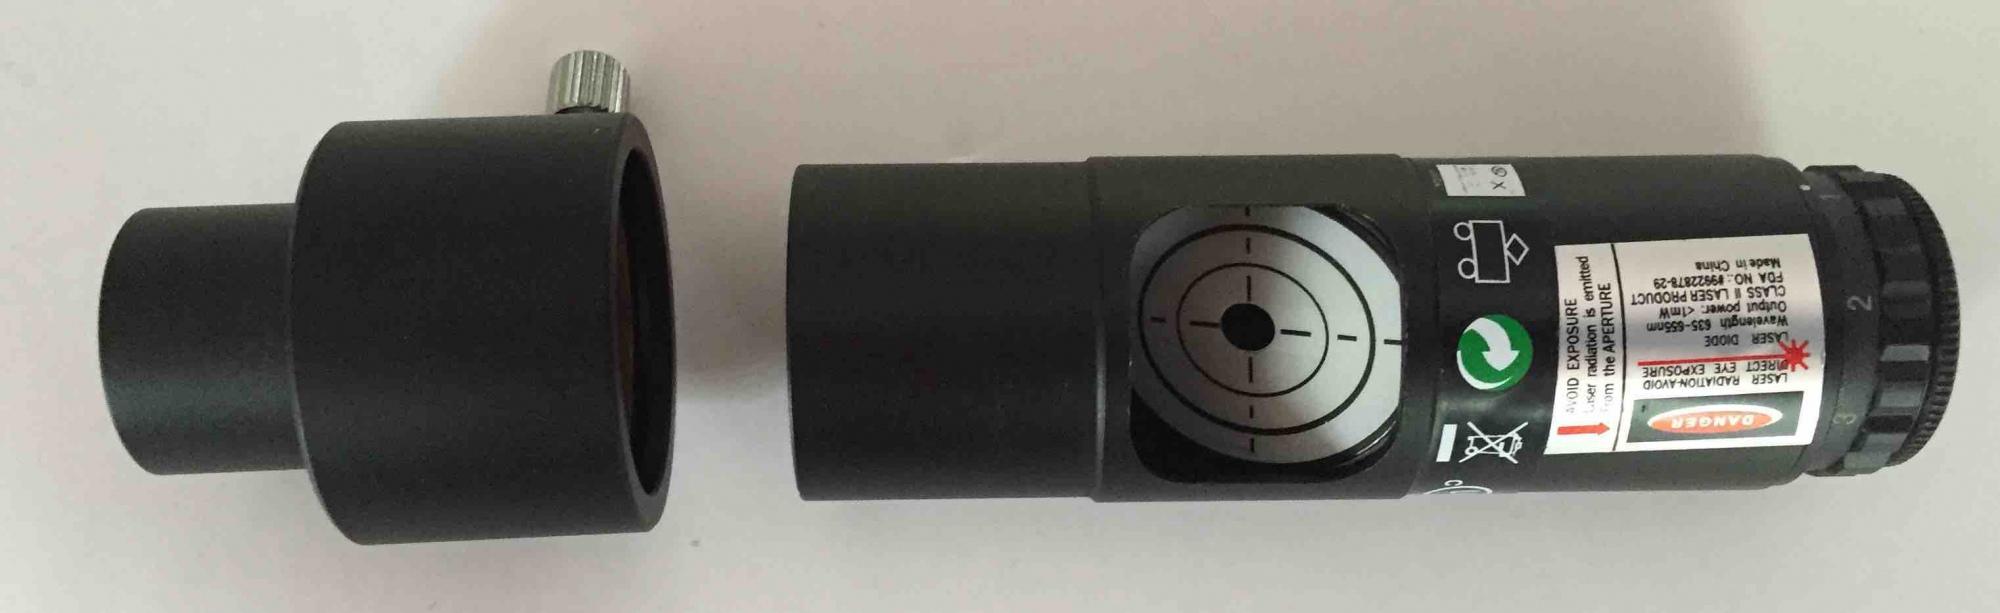 laser.thumb.jpg.8e5f2b1662ef9bfc32b93f6732c6a496.jpg